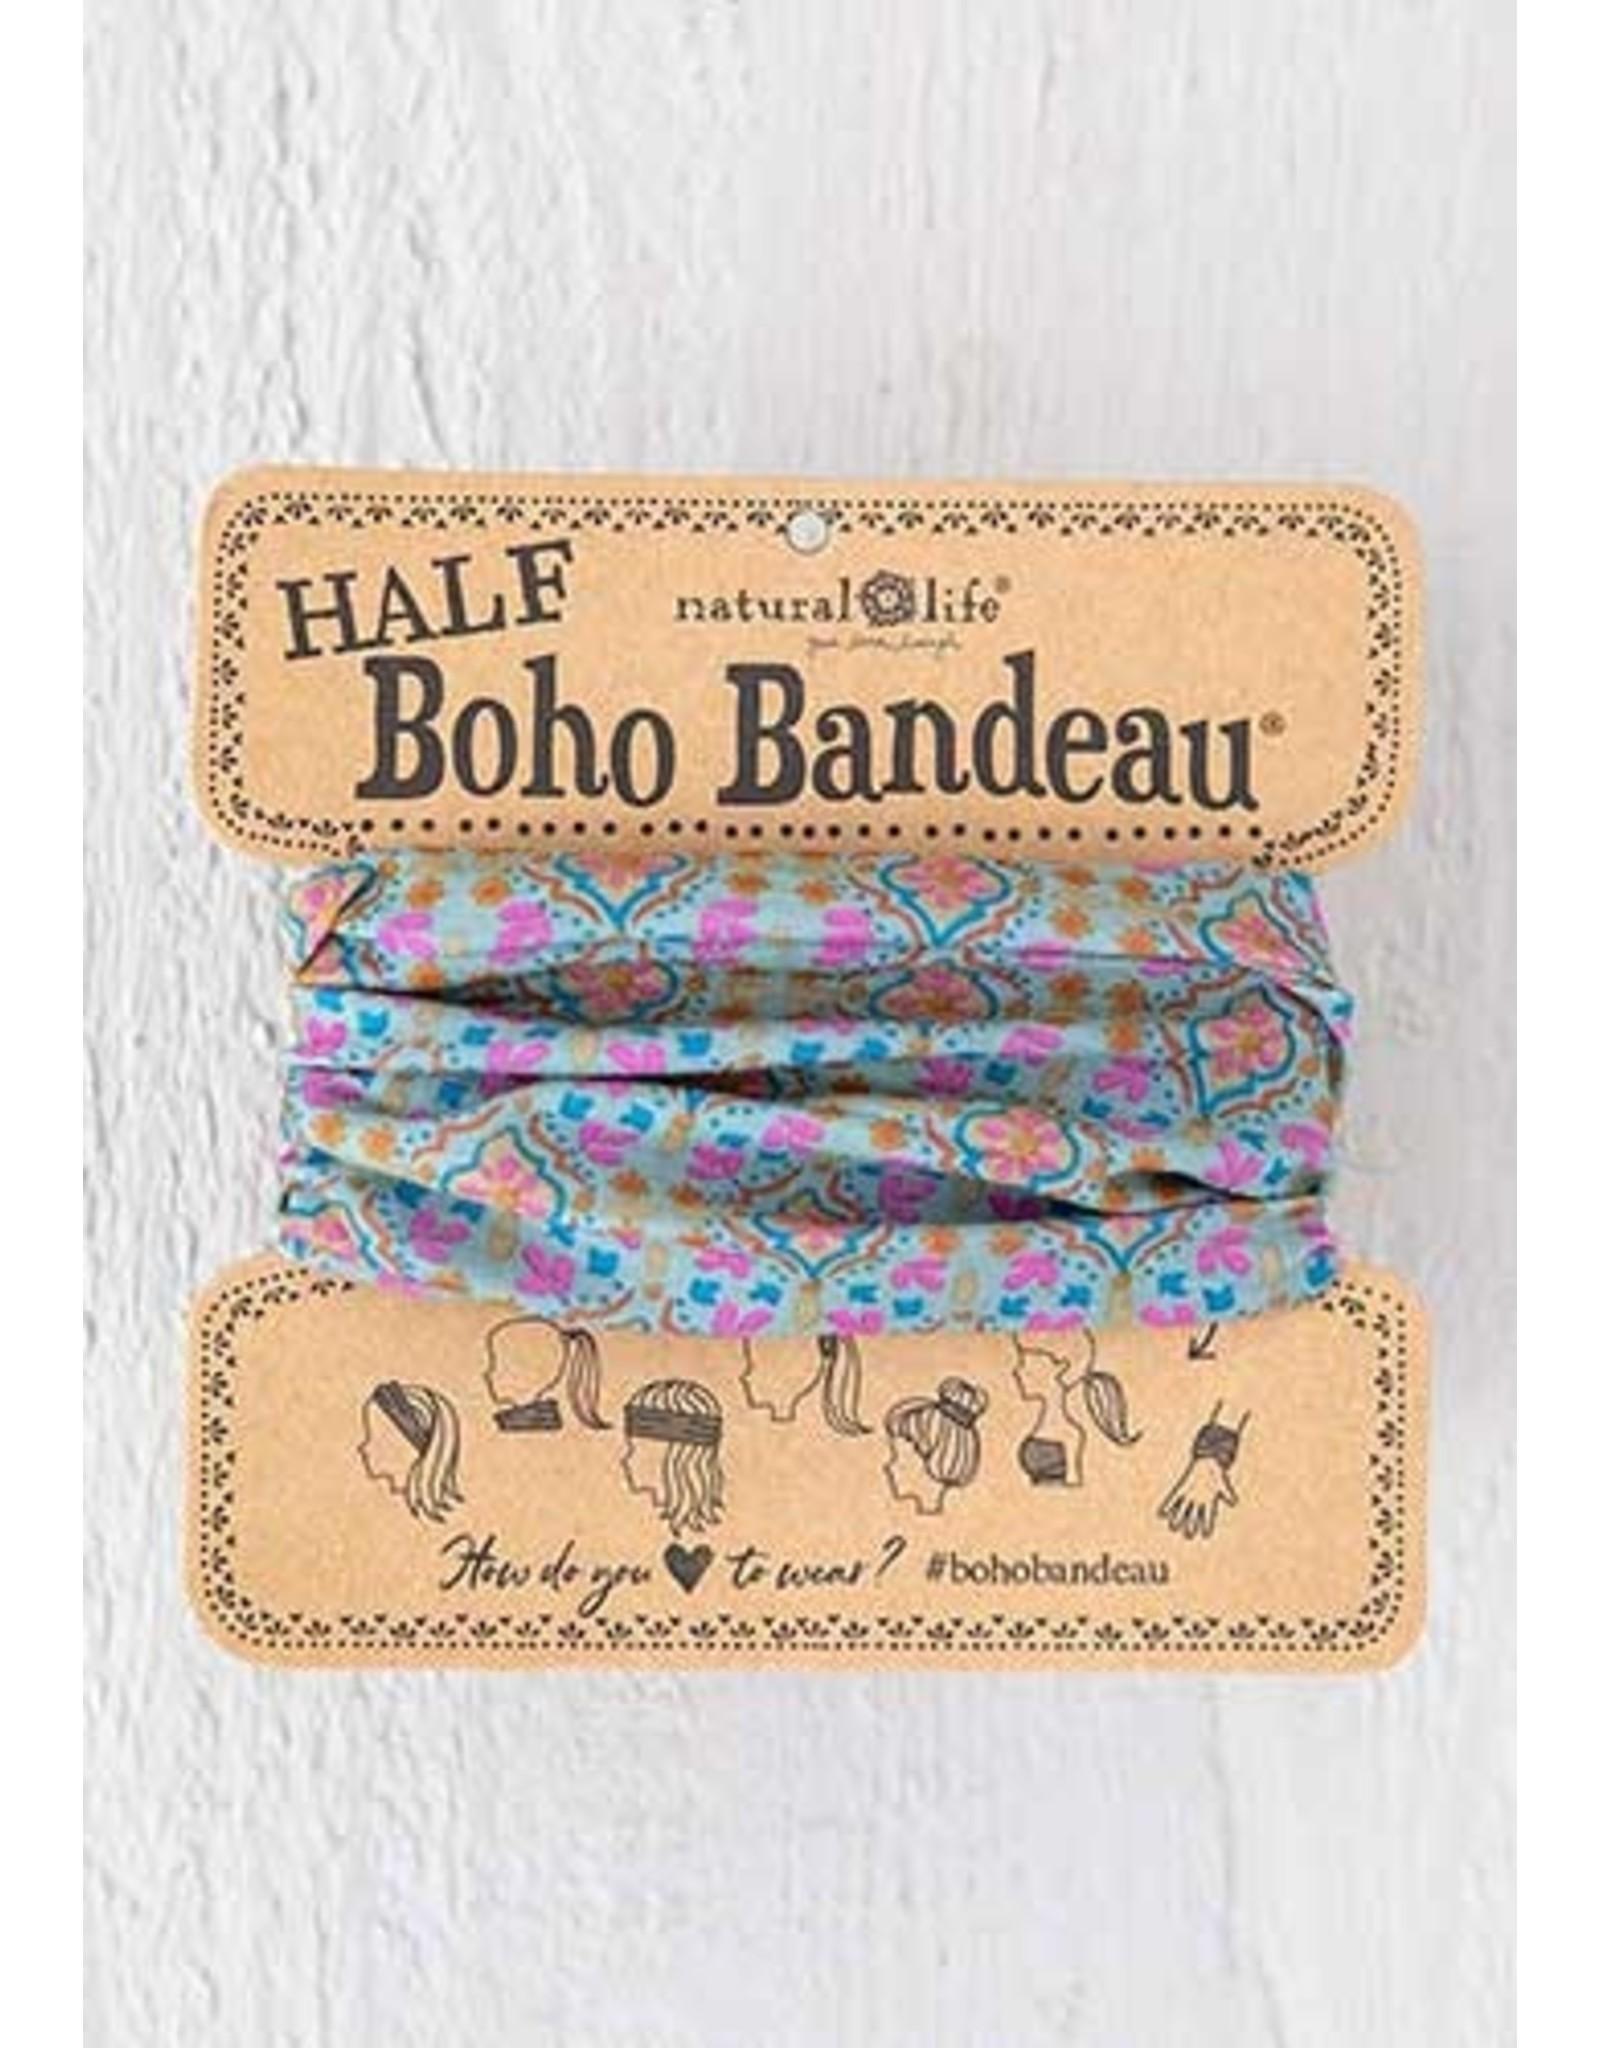 Natural LIfe Half Boho Bandeau, Turquoise Orange Stamp